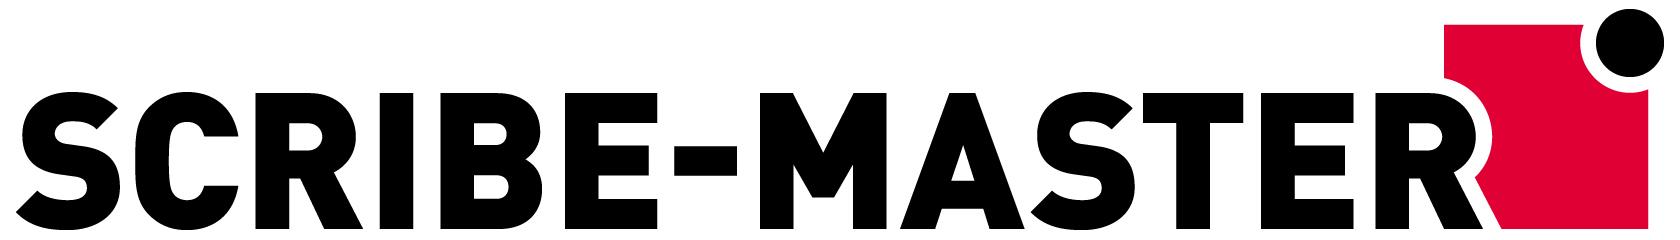 Scribe-Master logo